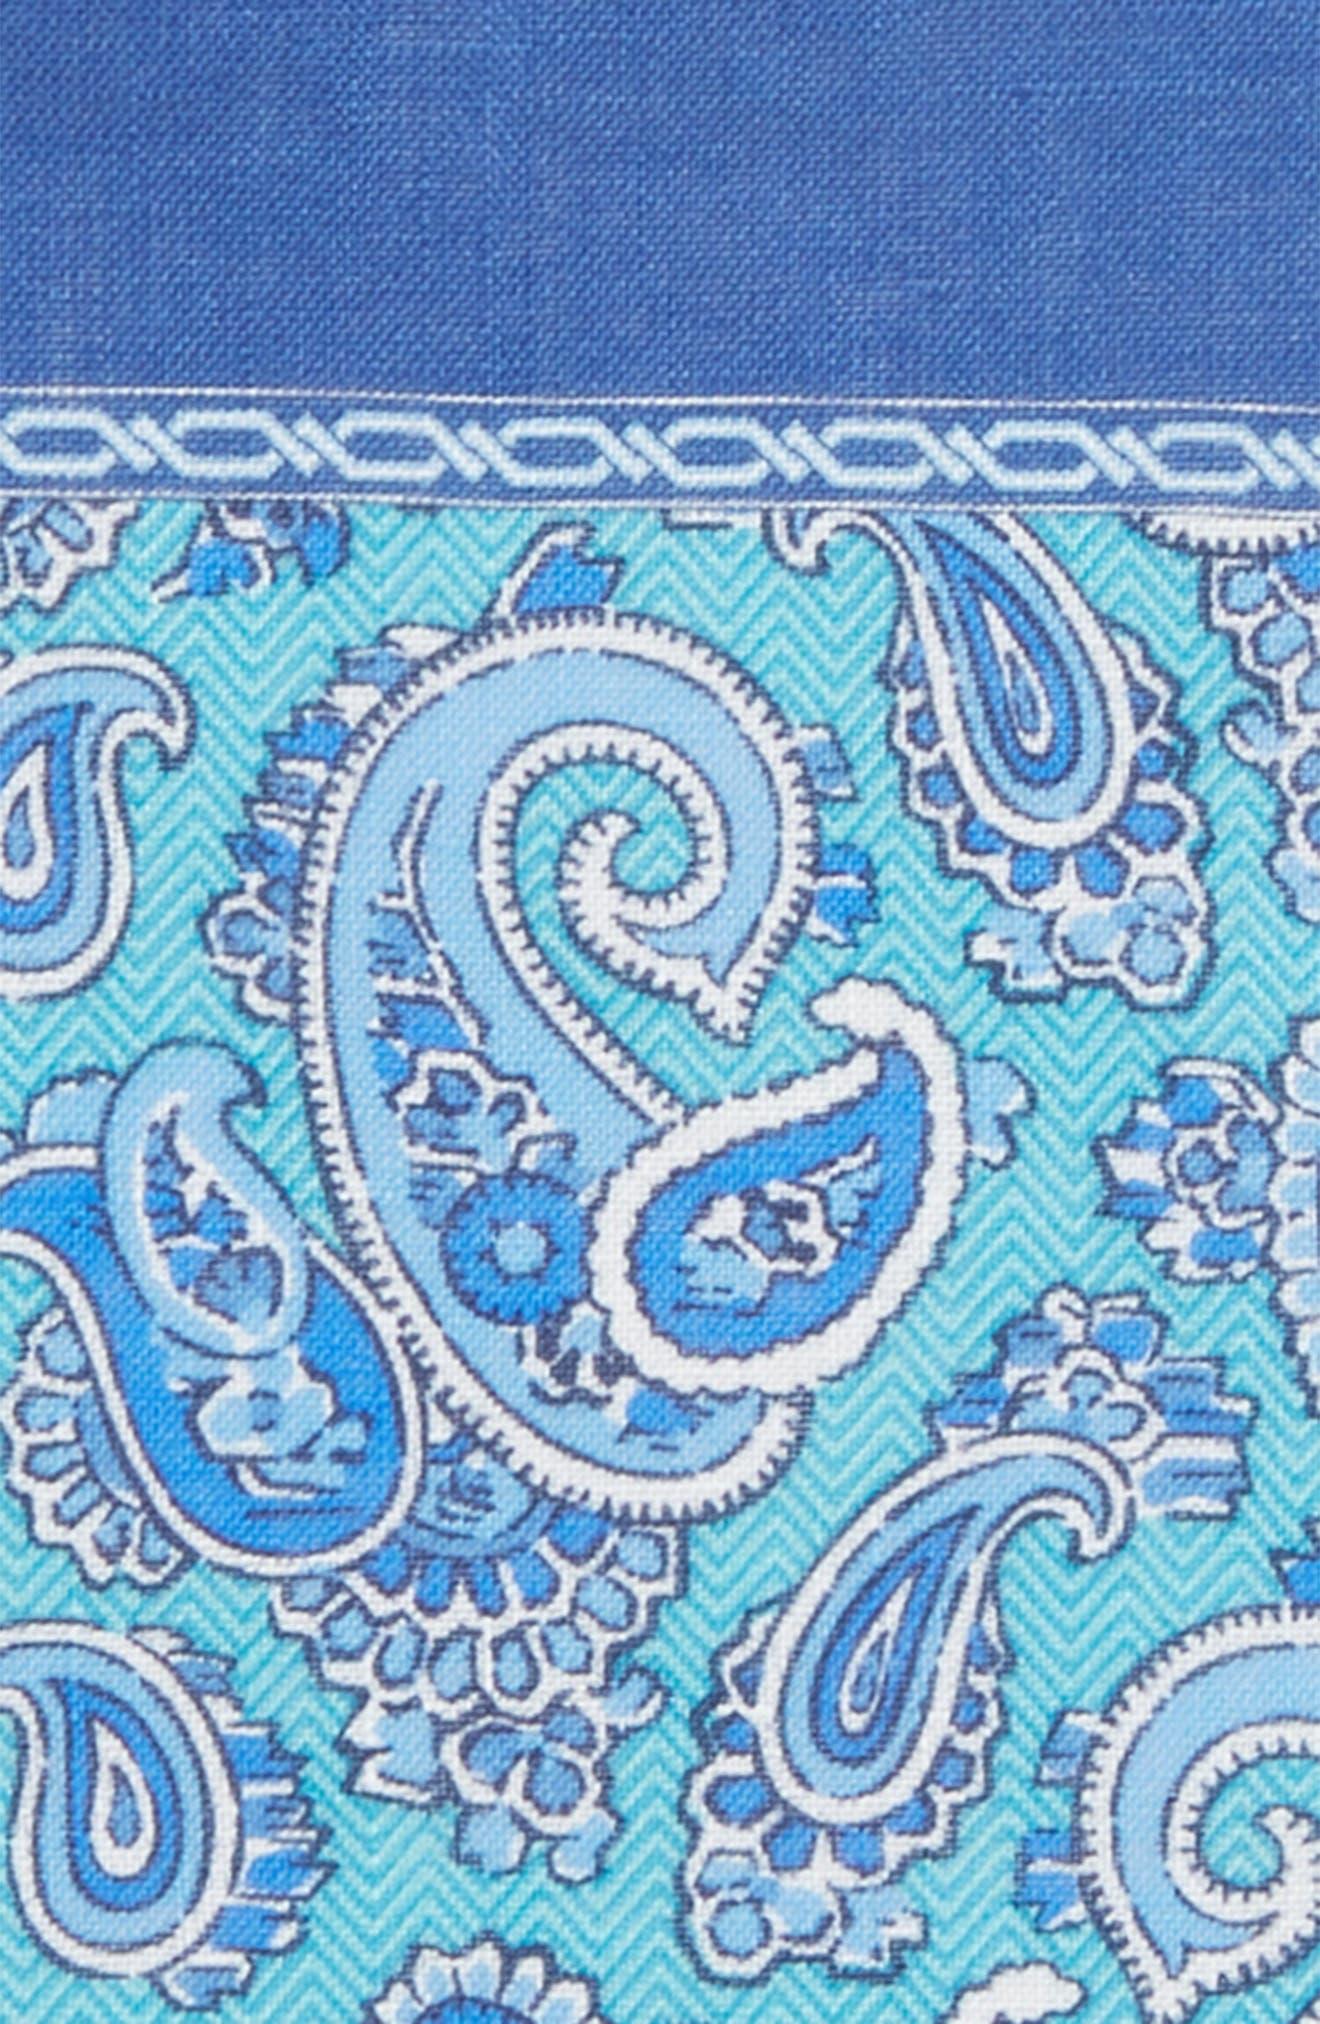 Paisley Linen Pocket Square,                             Alternate thumbnail 3, color,                             Seafoam